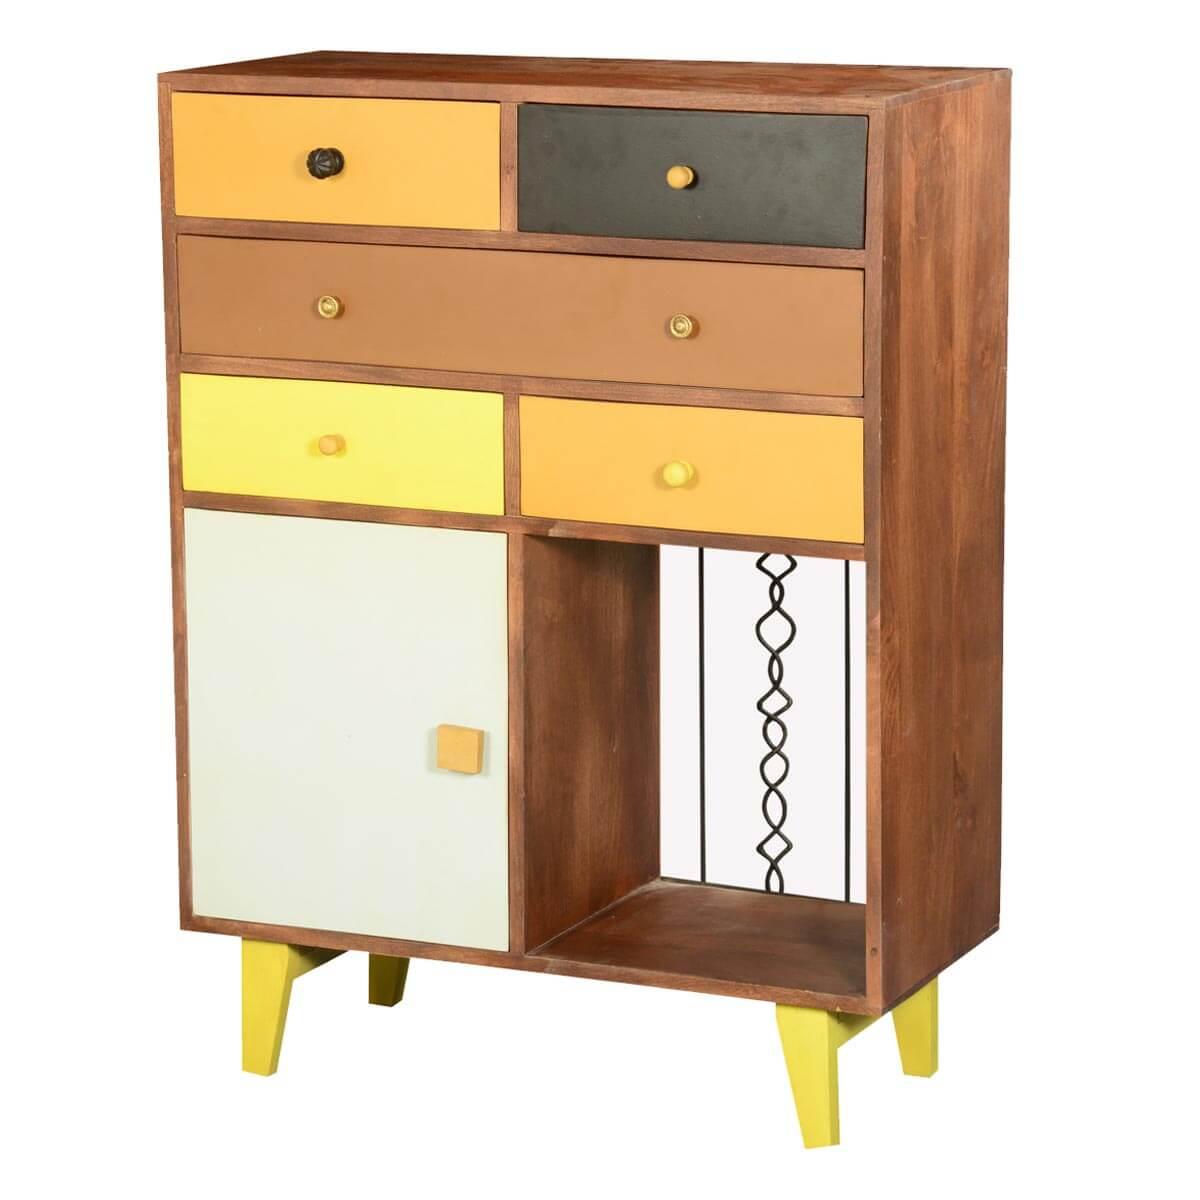 60's Retro Earth Tones Mango Wood 5 Drawer Dresser